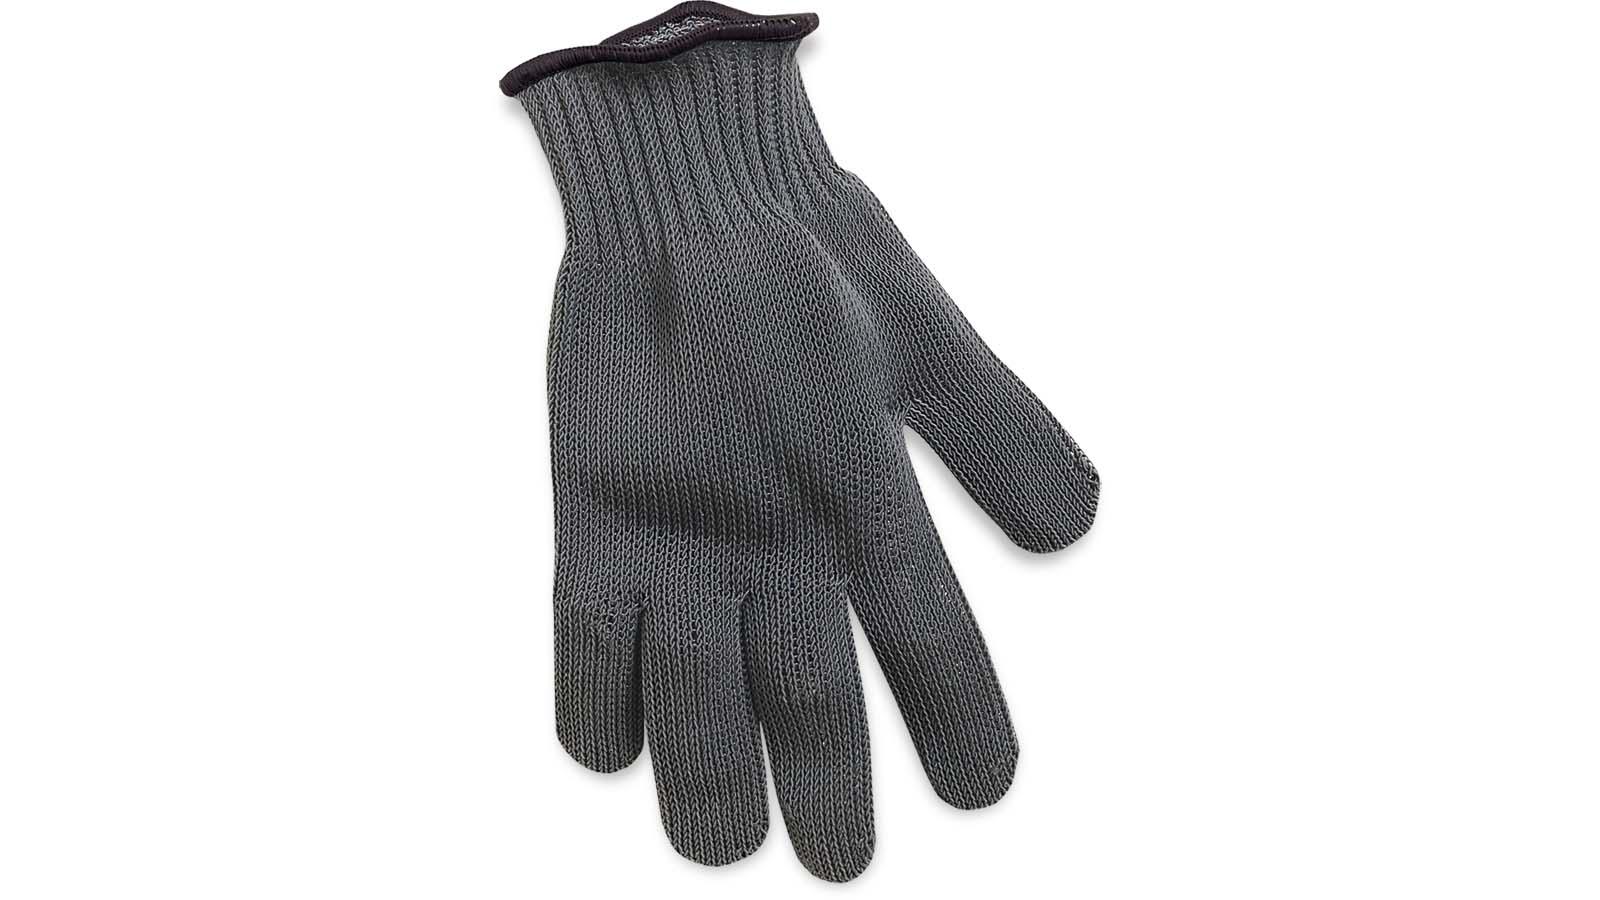 Rapala BPFGM Tuff-Knit Fillet Glove - Medium